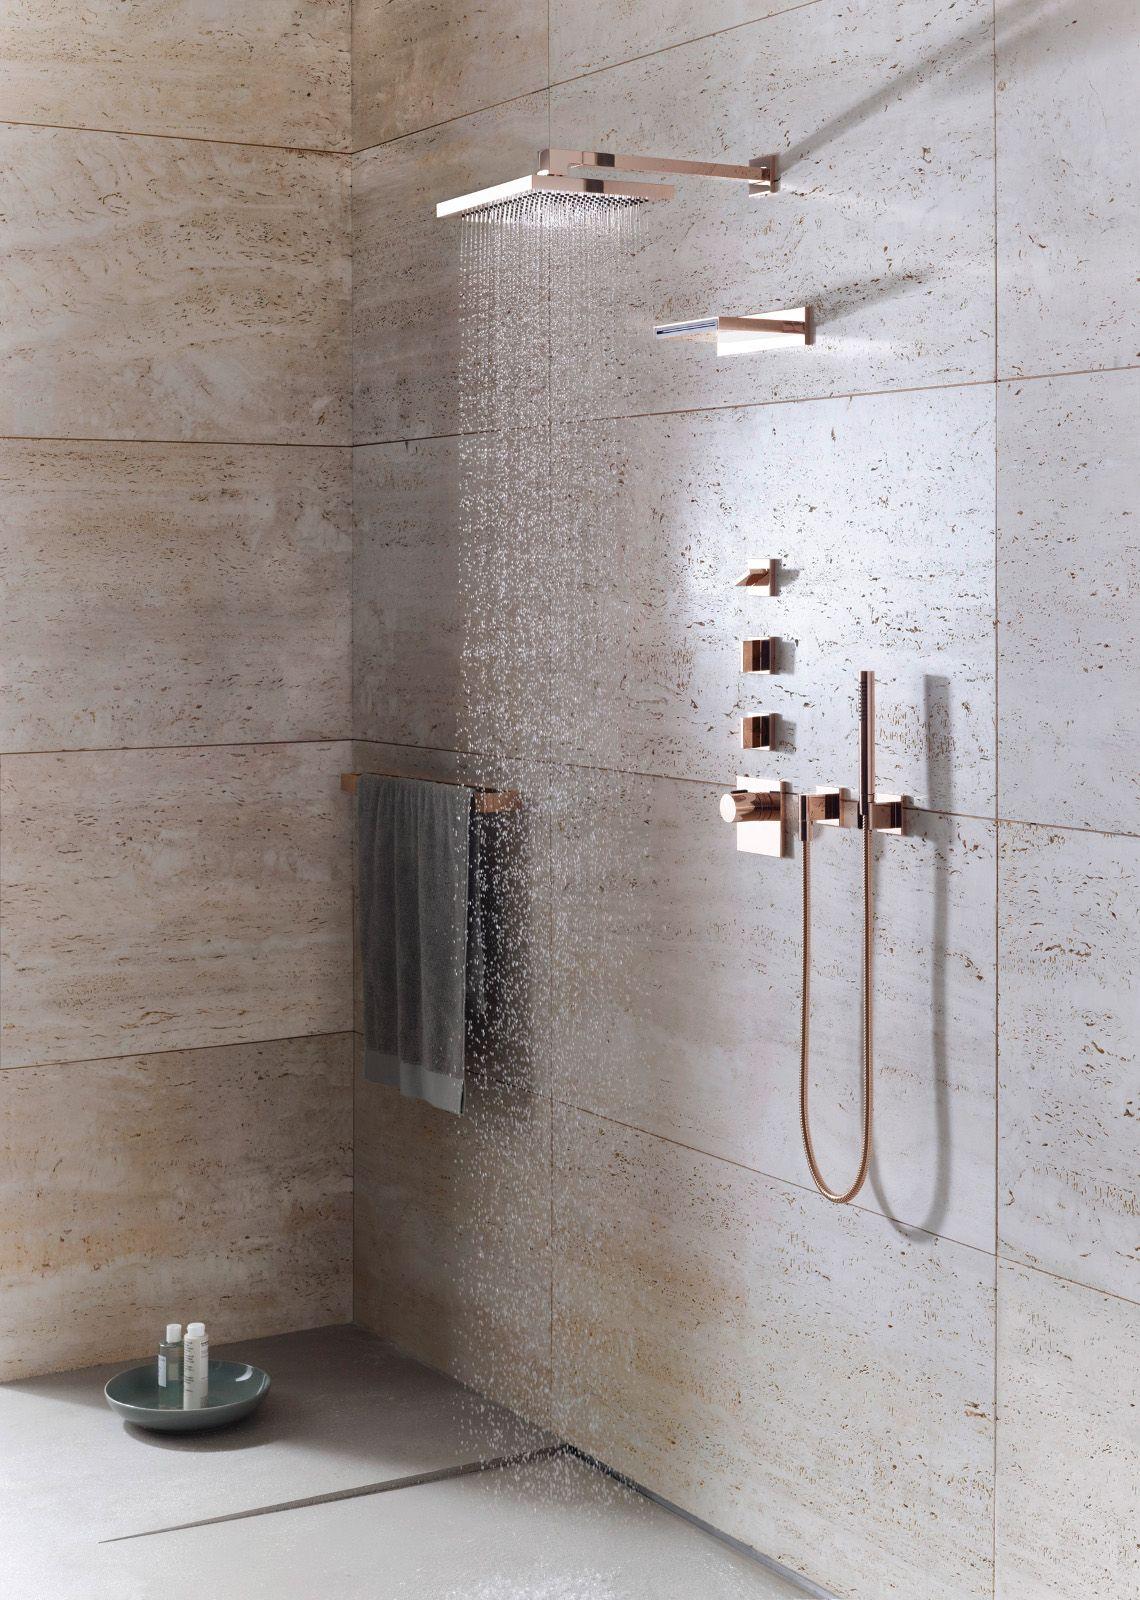 Rosegold fixtures love the rose gold fixtures especially the shower head dornbracht mem series